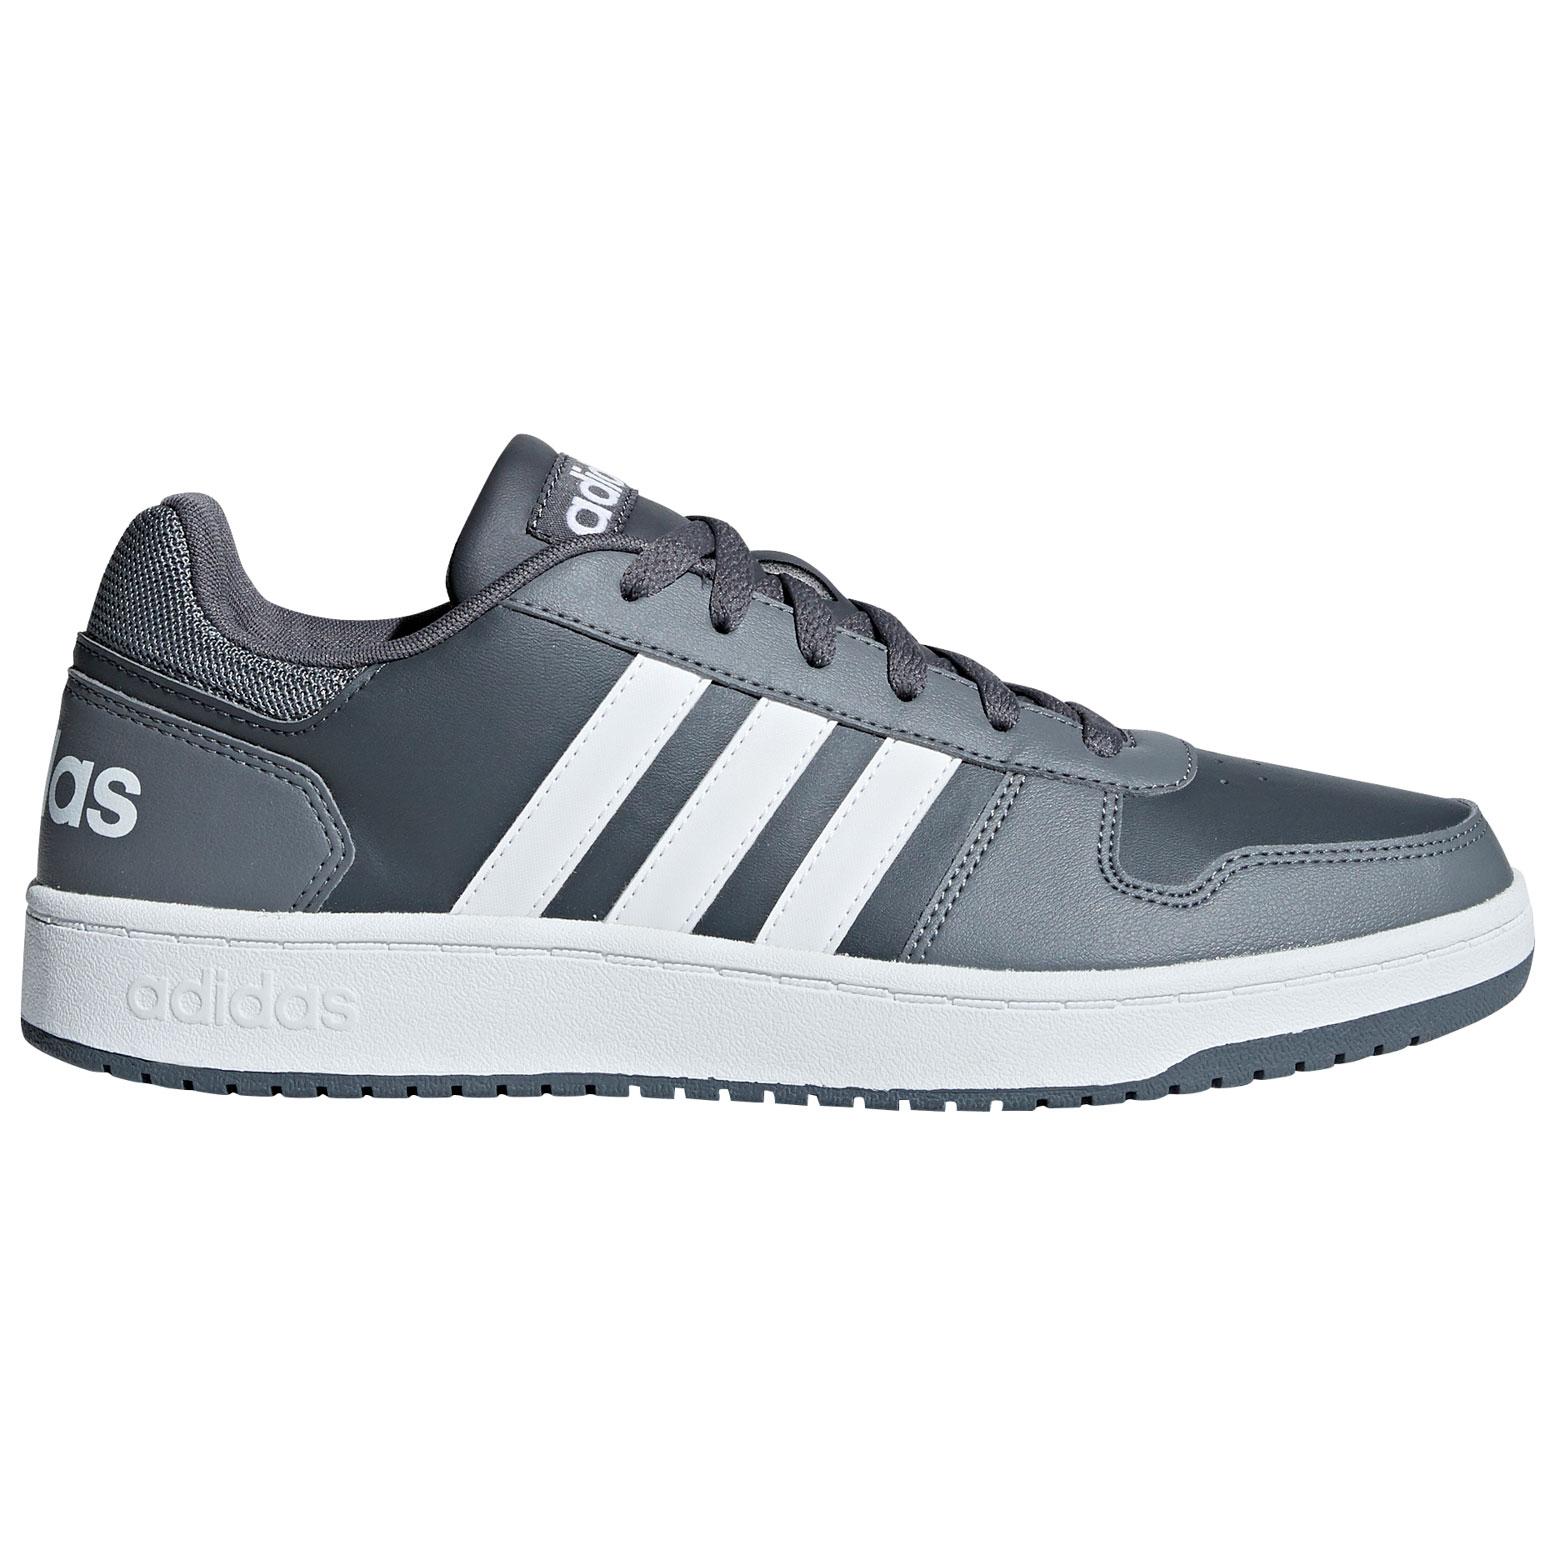 Übergröße Adidas Herren Sneaker Übergröße Herren Sneaker Sneaker Adidas Übergröße Adidas Herren vTpnxPqp